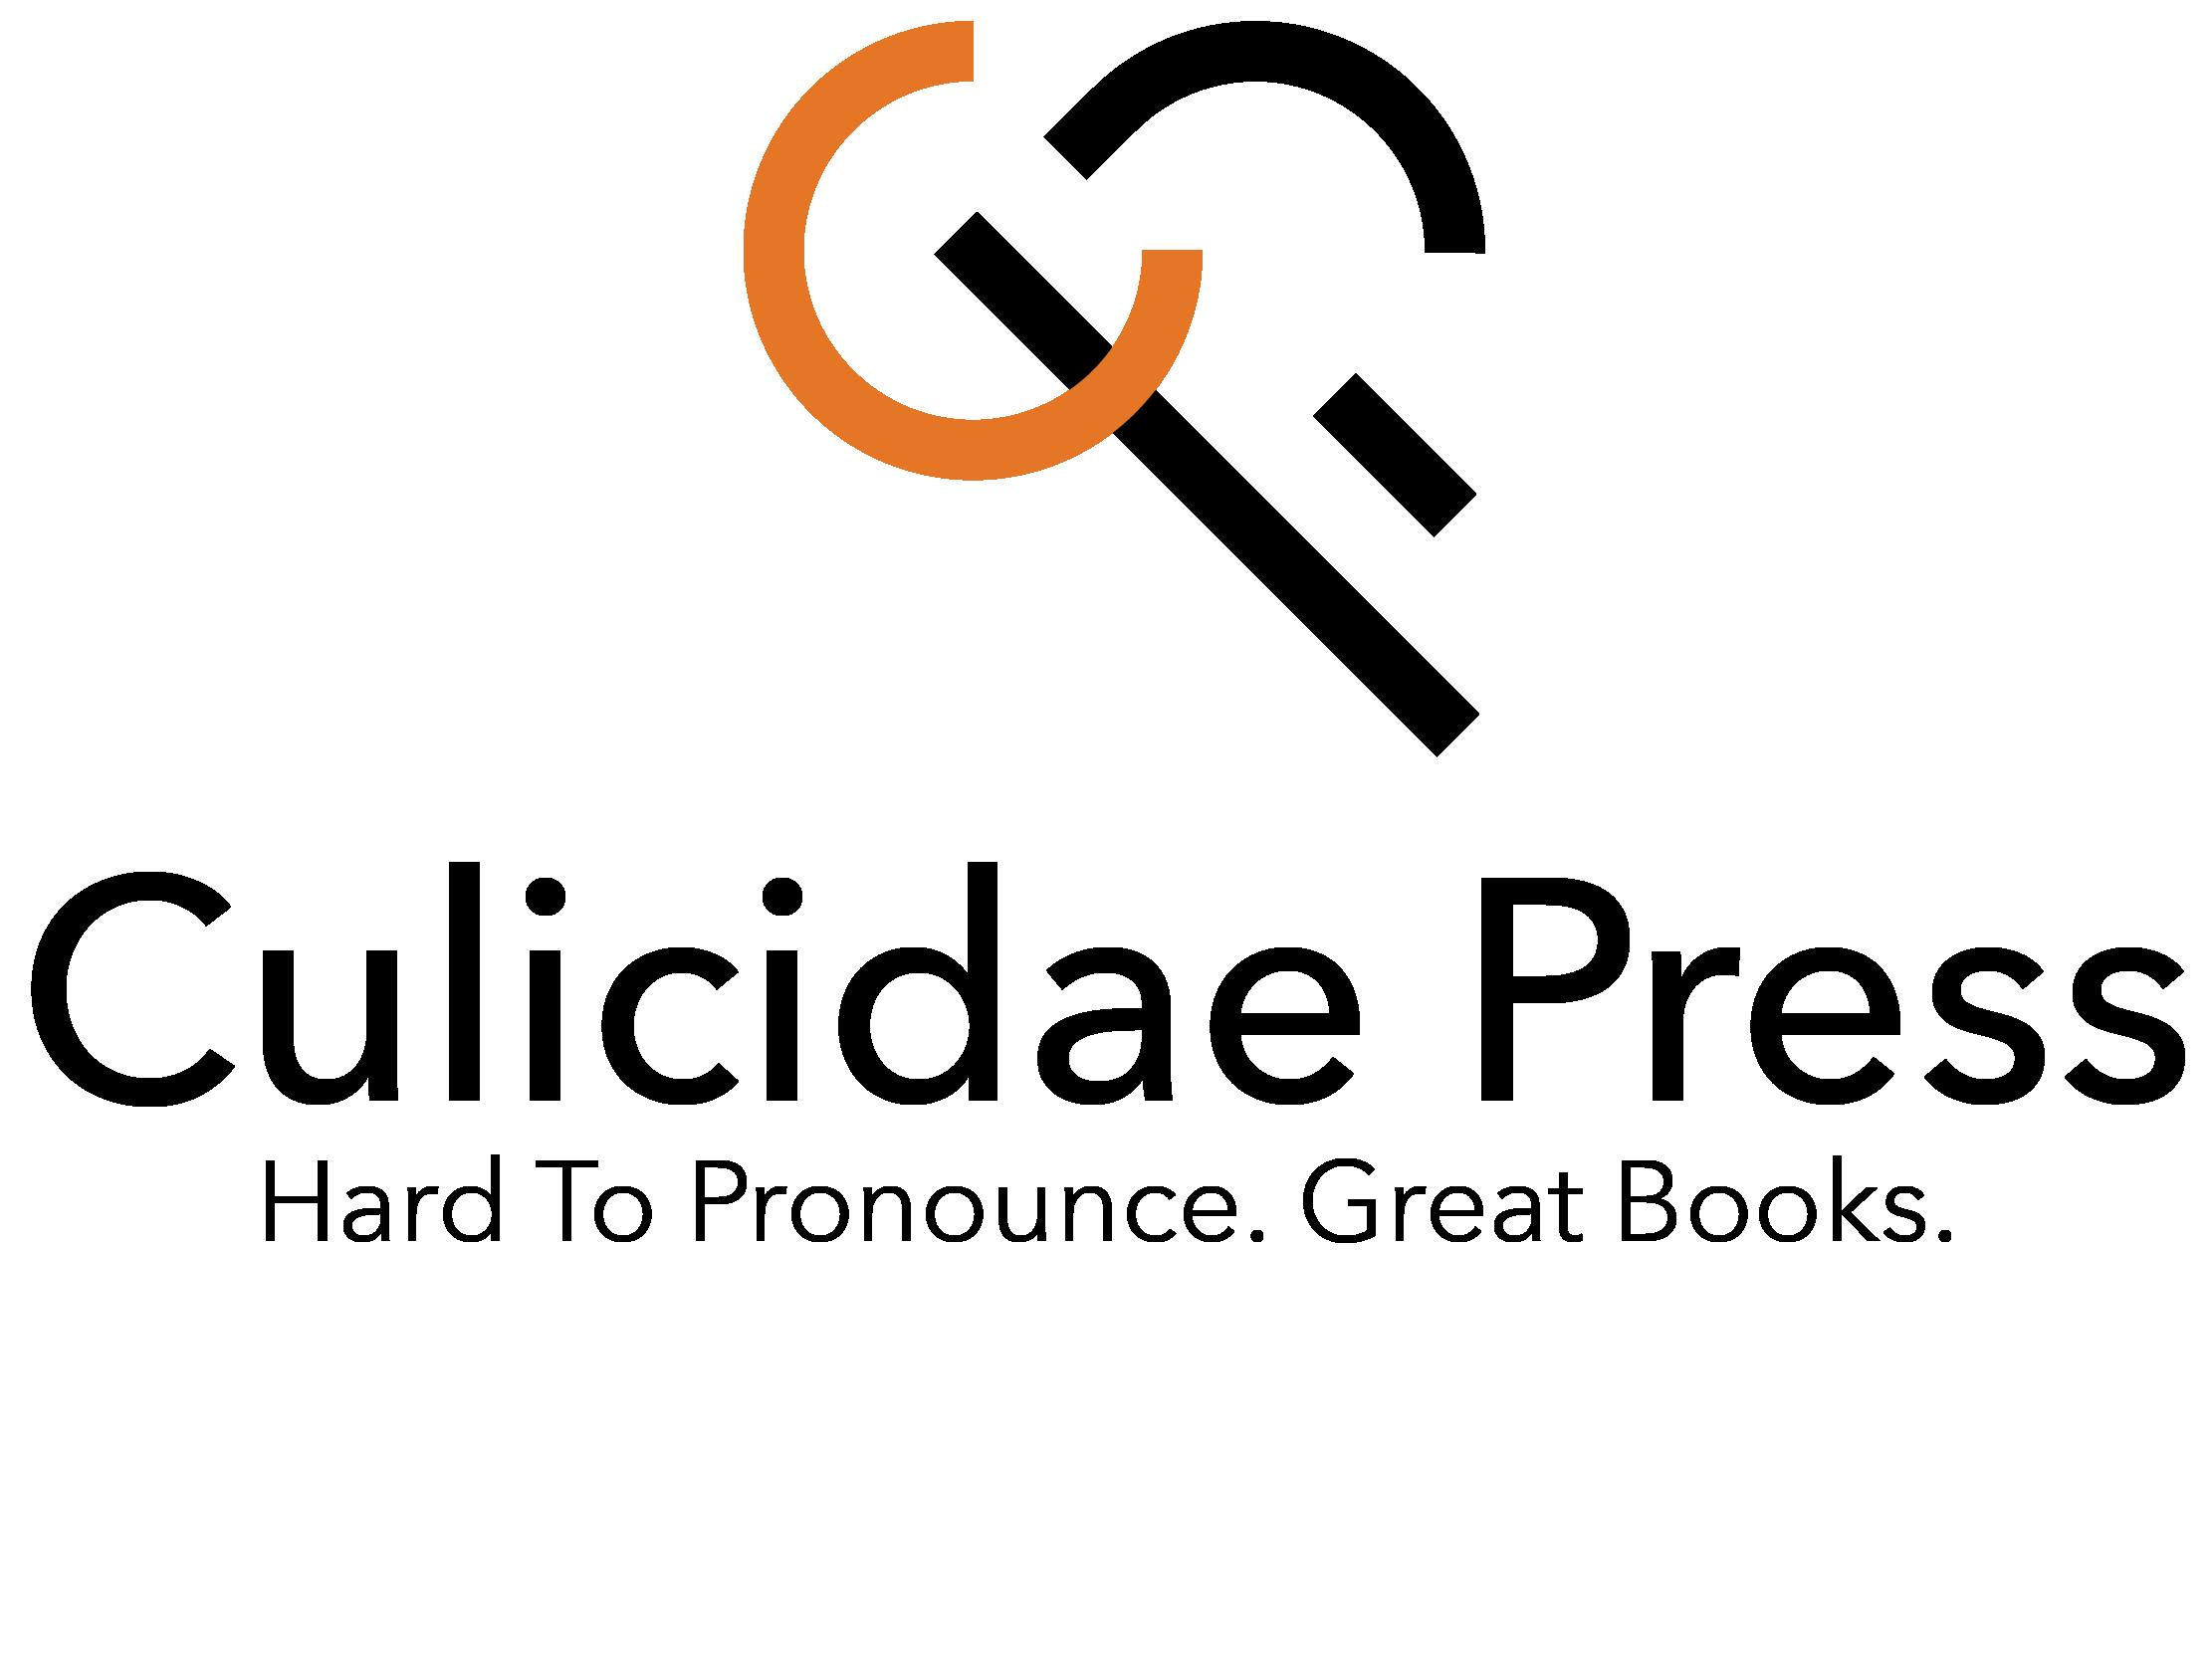 Culicidae Press